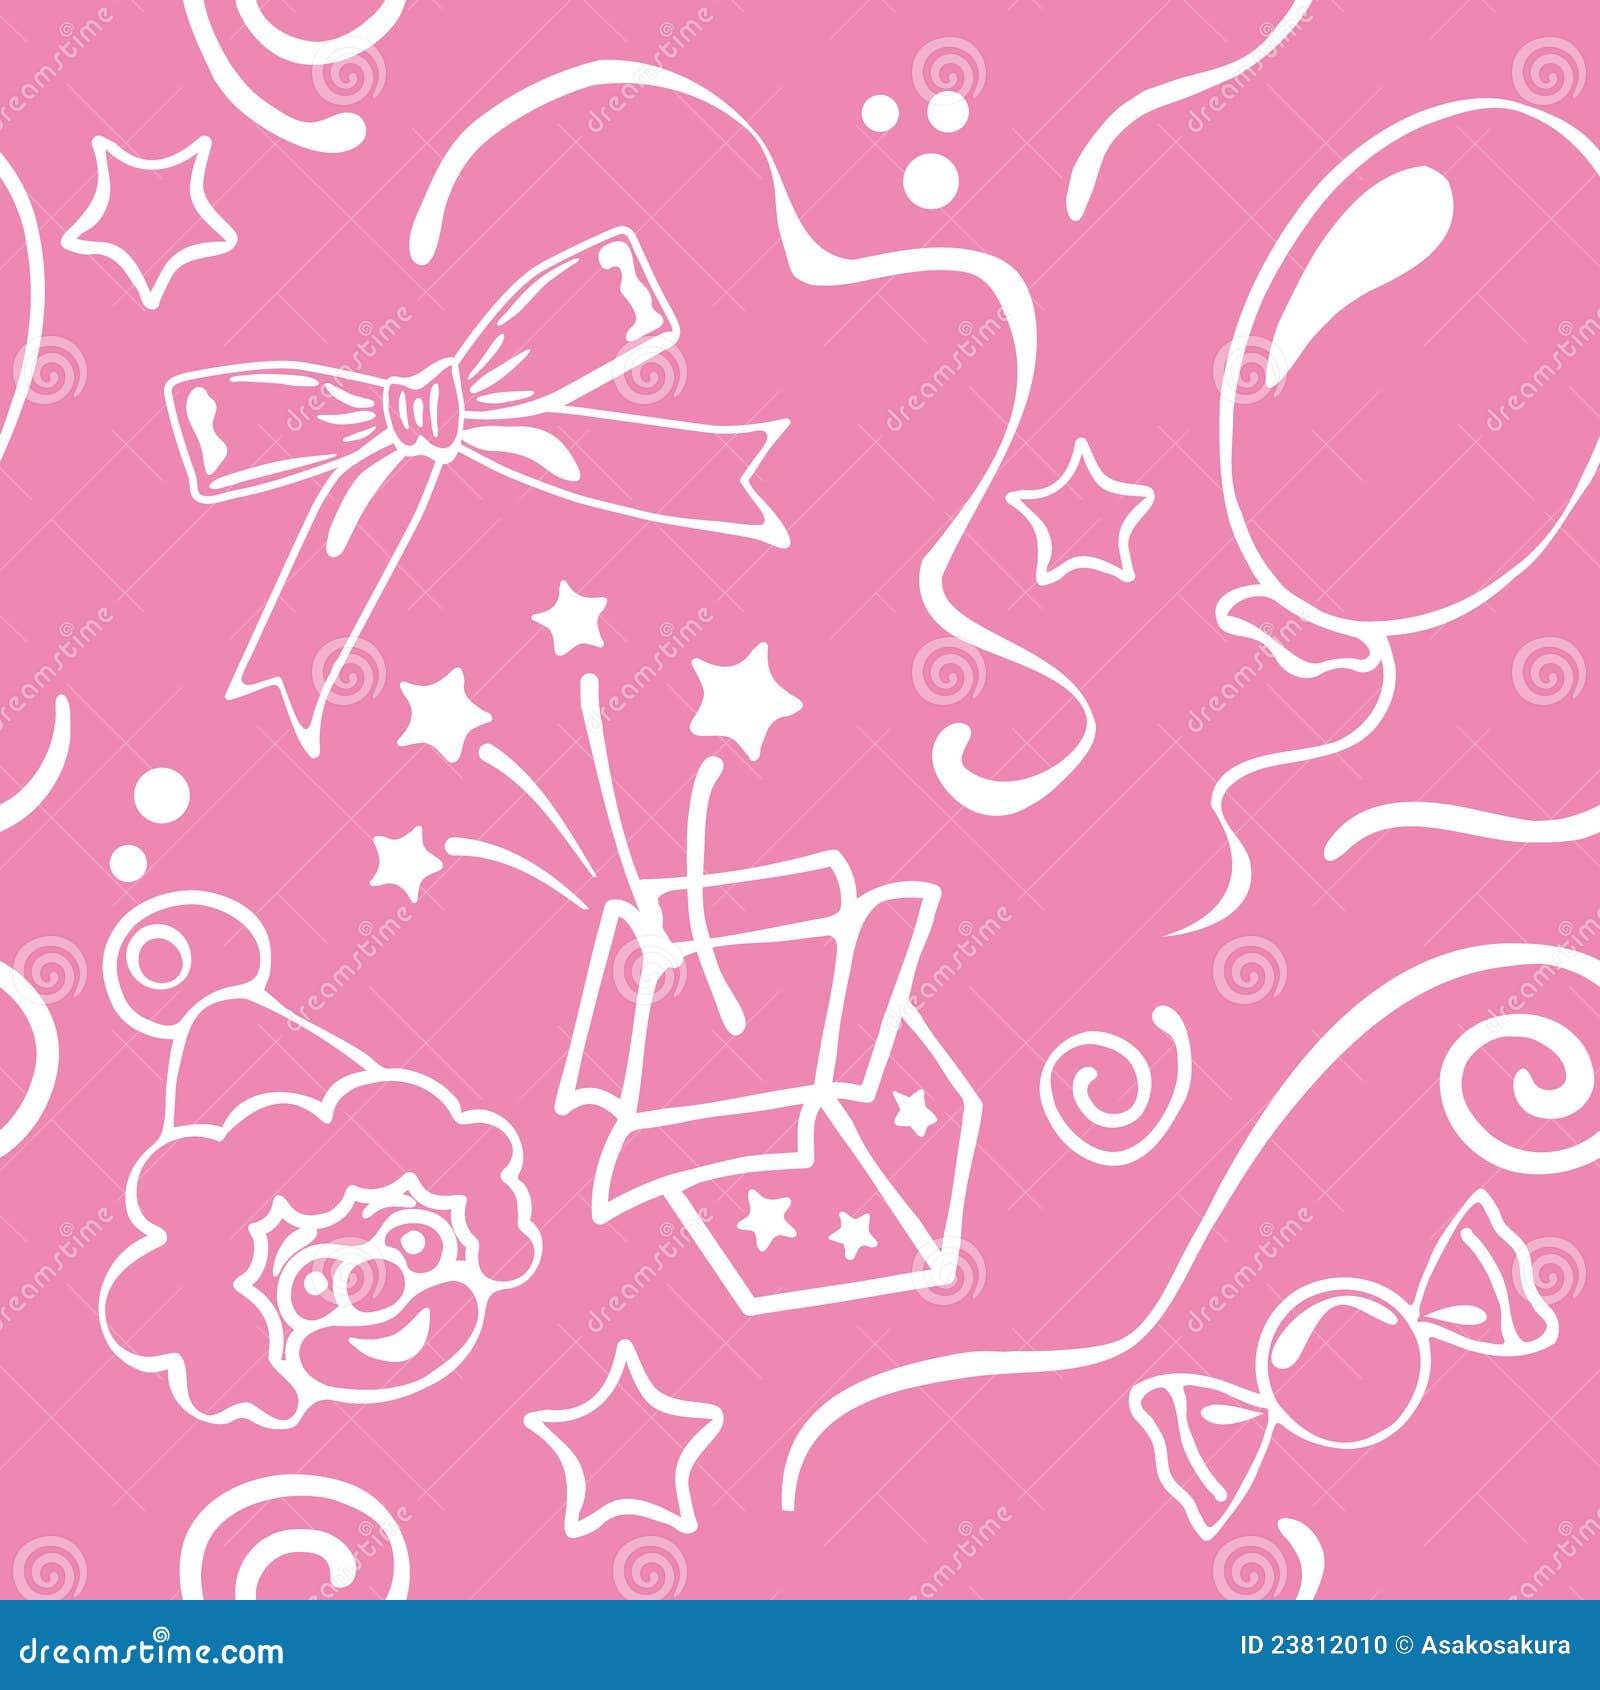 Girl Birthdays Seamless Background